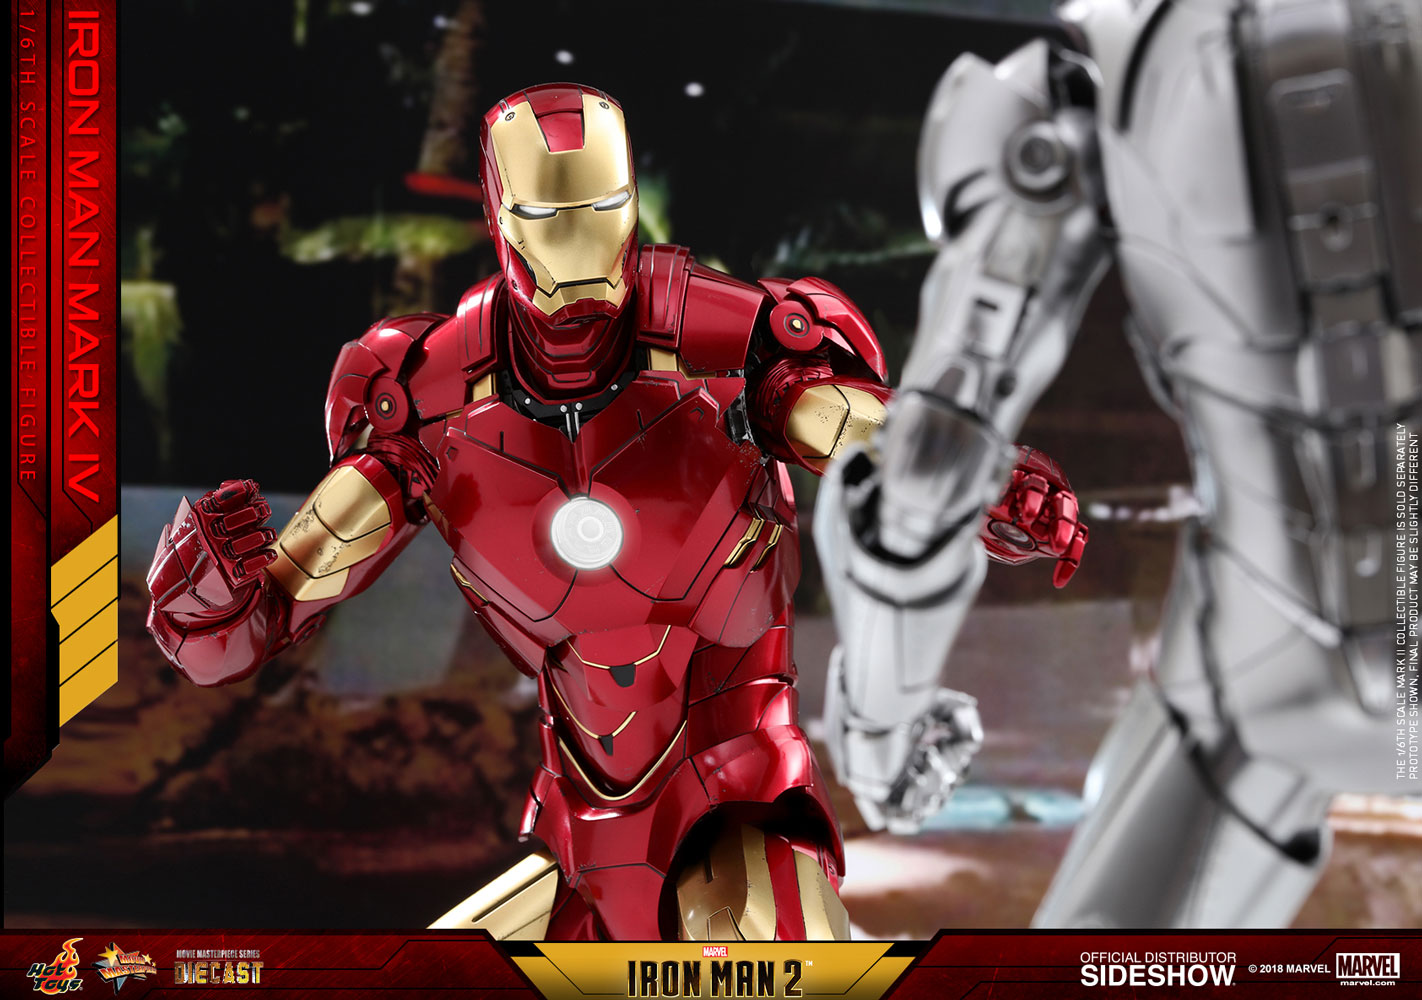 Marvel Iron Man Mark Iv Sixth Scale Figure By Hot Toys Sideshow